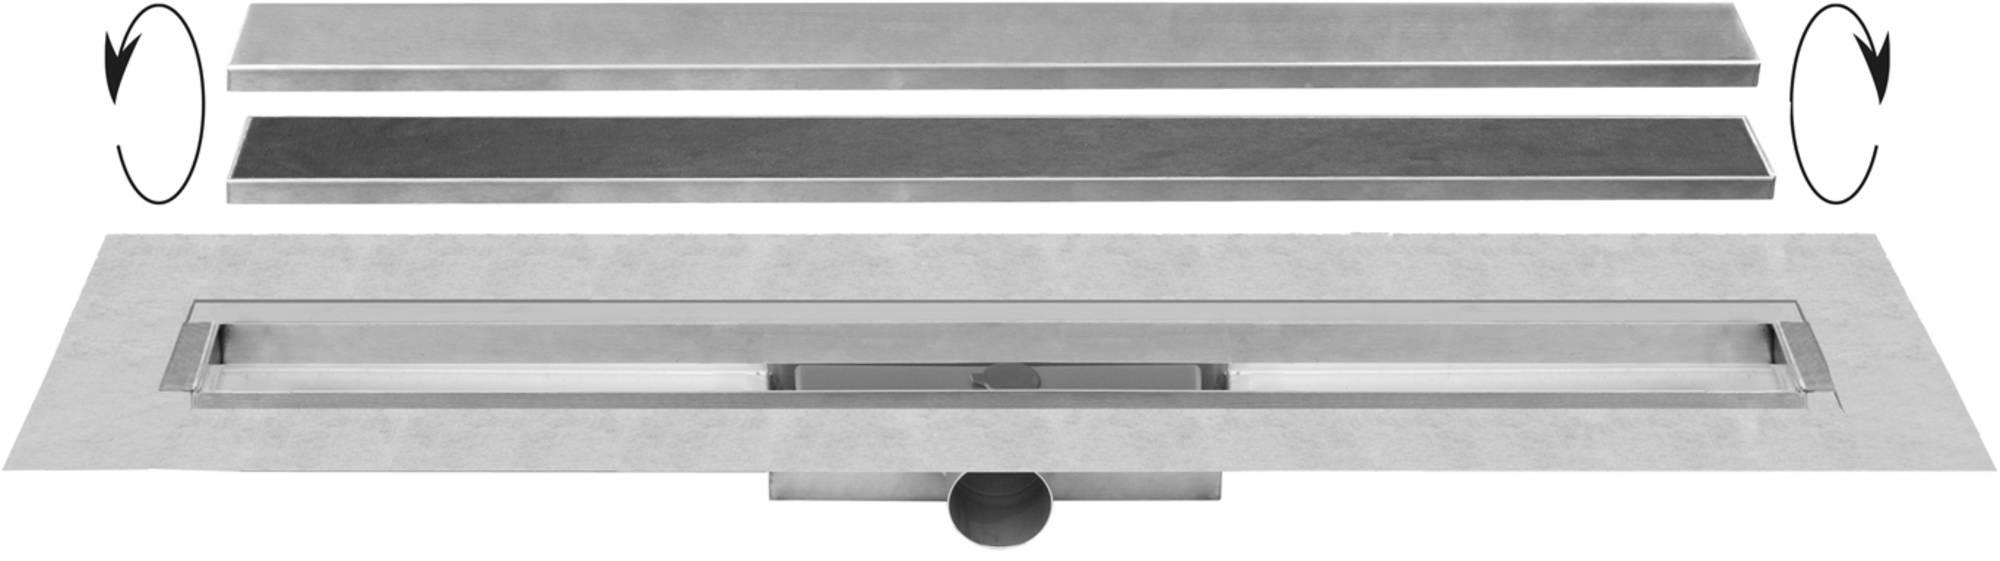 Easy Drain Compact 30 TAF Wall afvoergoot 70 x 6 cm. zijaansluiting Rvs